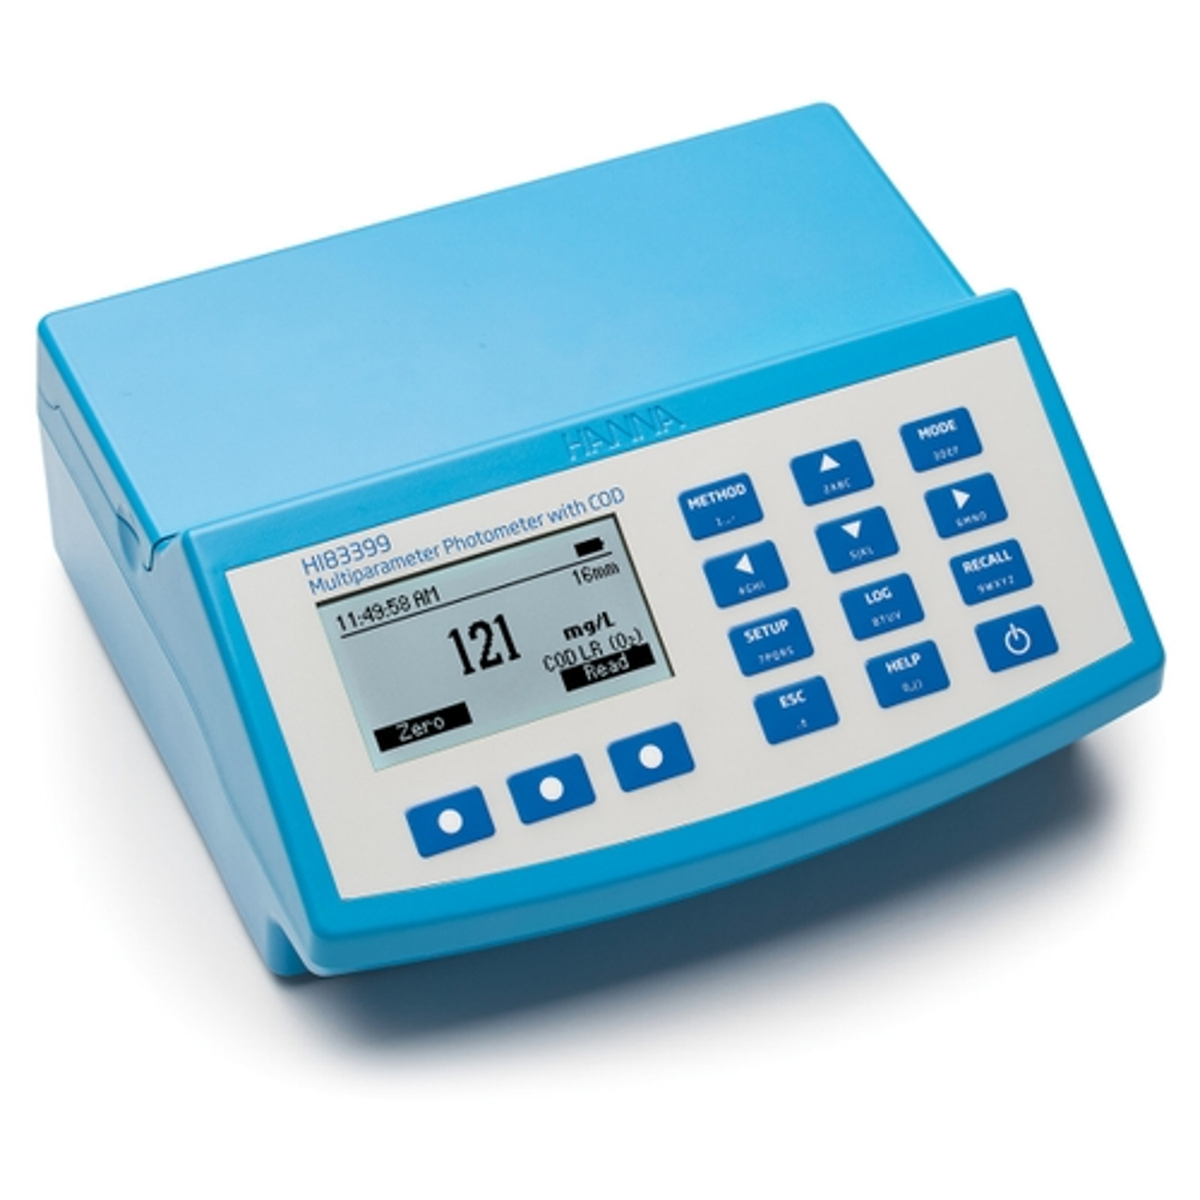 HI83399 - Fotometro multiparametro con COD (78 metodi)